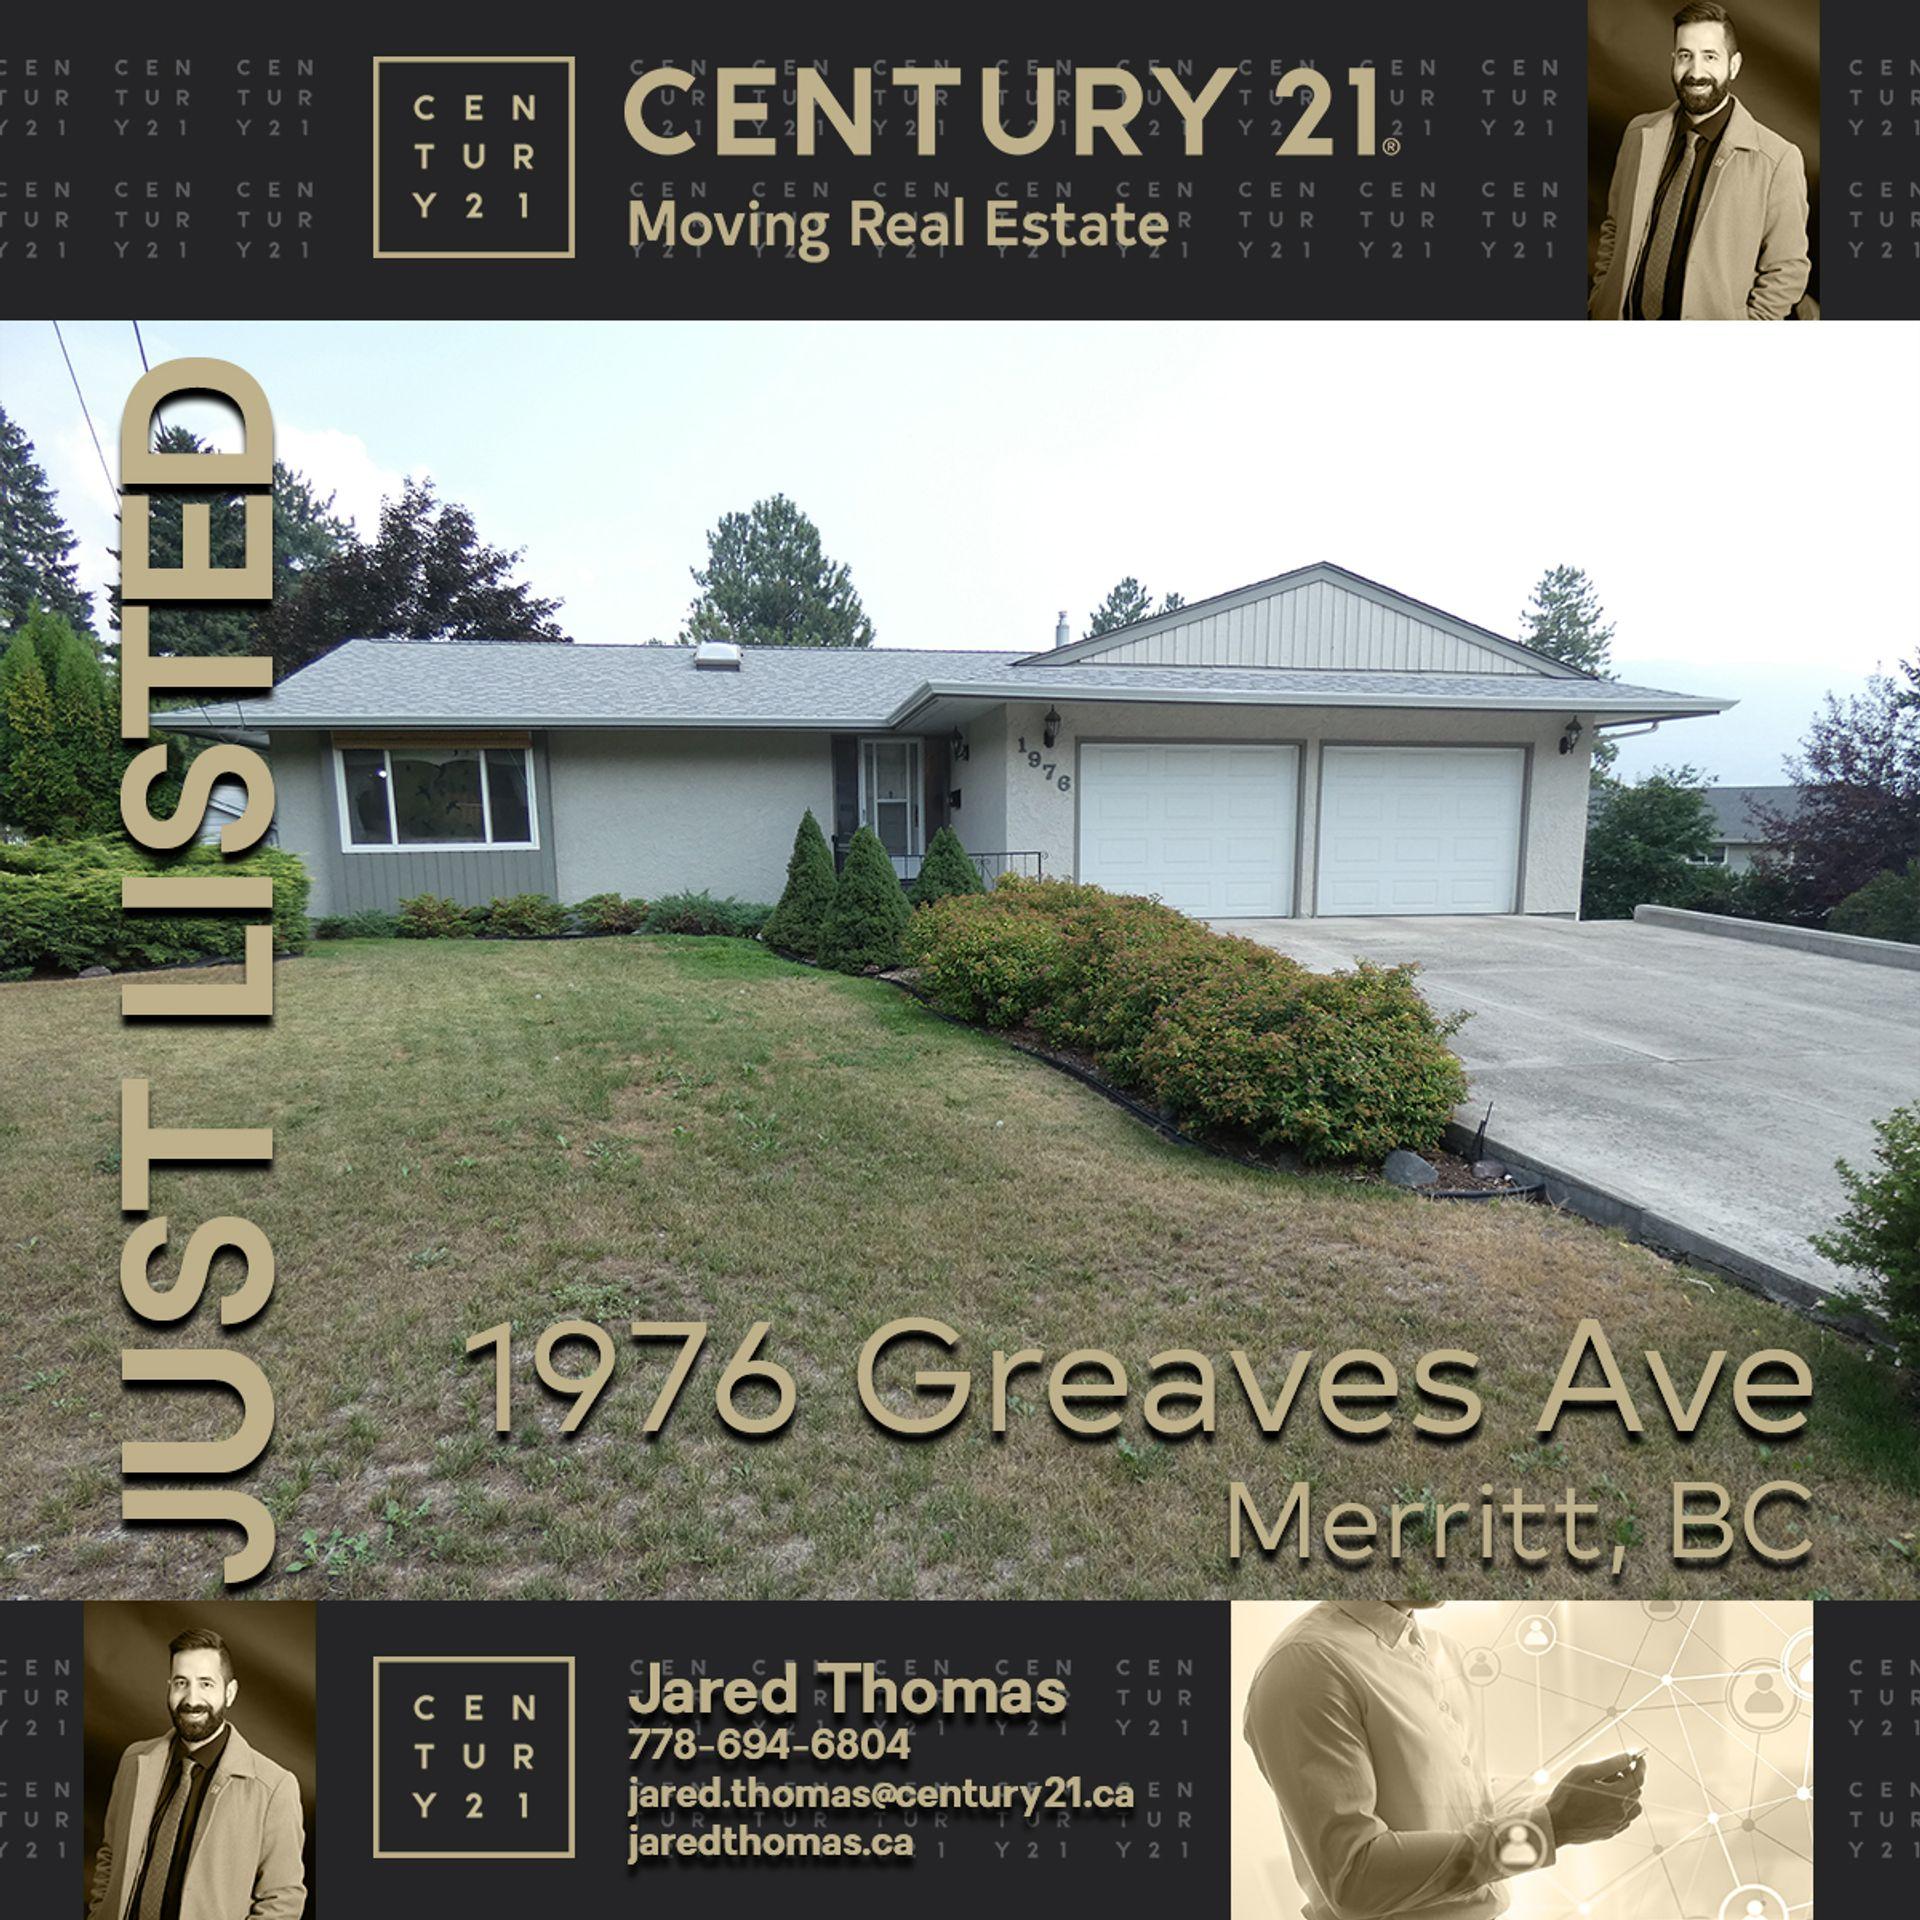 1976 Greaves Avenue, Merritt, South West